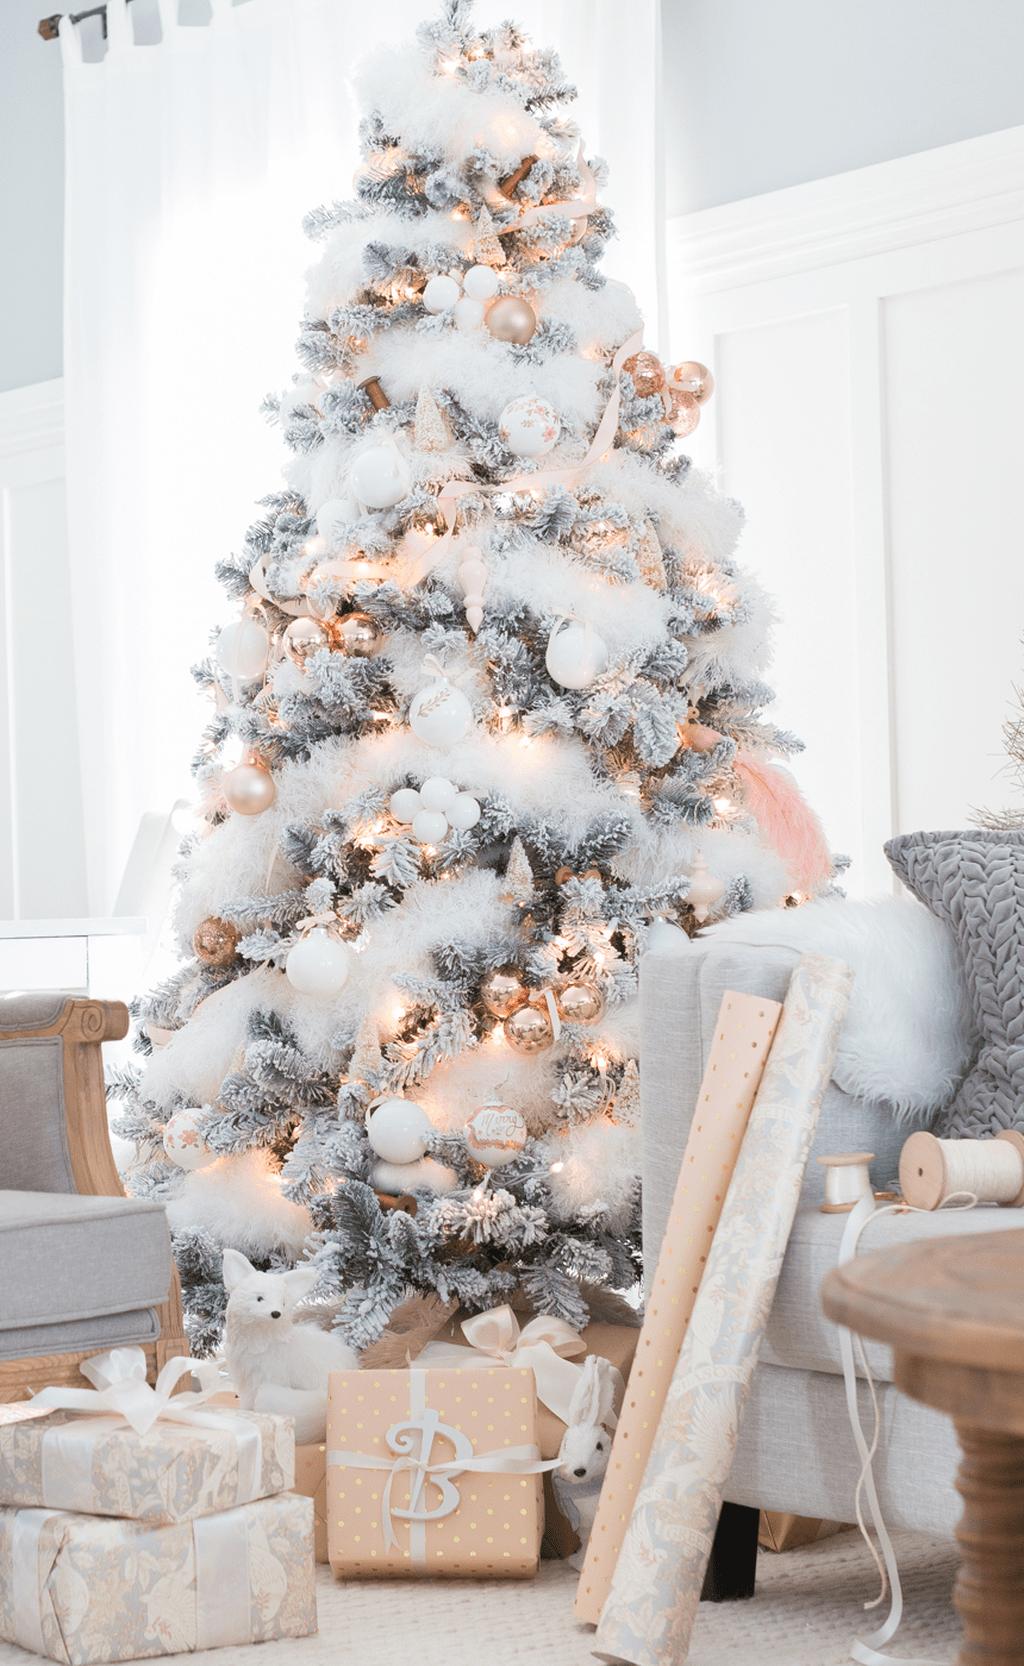 48 Stunning White Christmas Tree Ideas To Decorate Your Interior Pimphomee Amazing Christmas Trees Rose Gold Christmas Tree Christmas Tree Inspiration